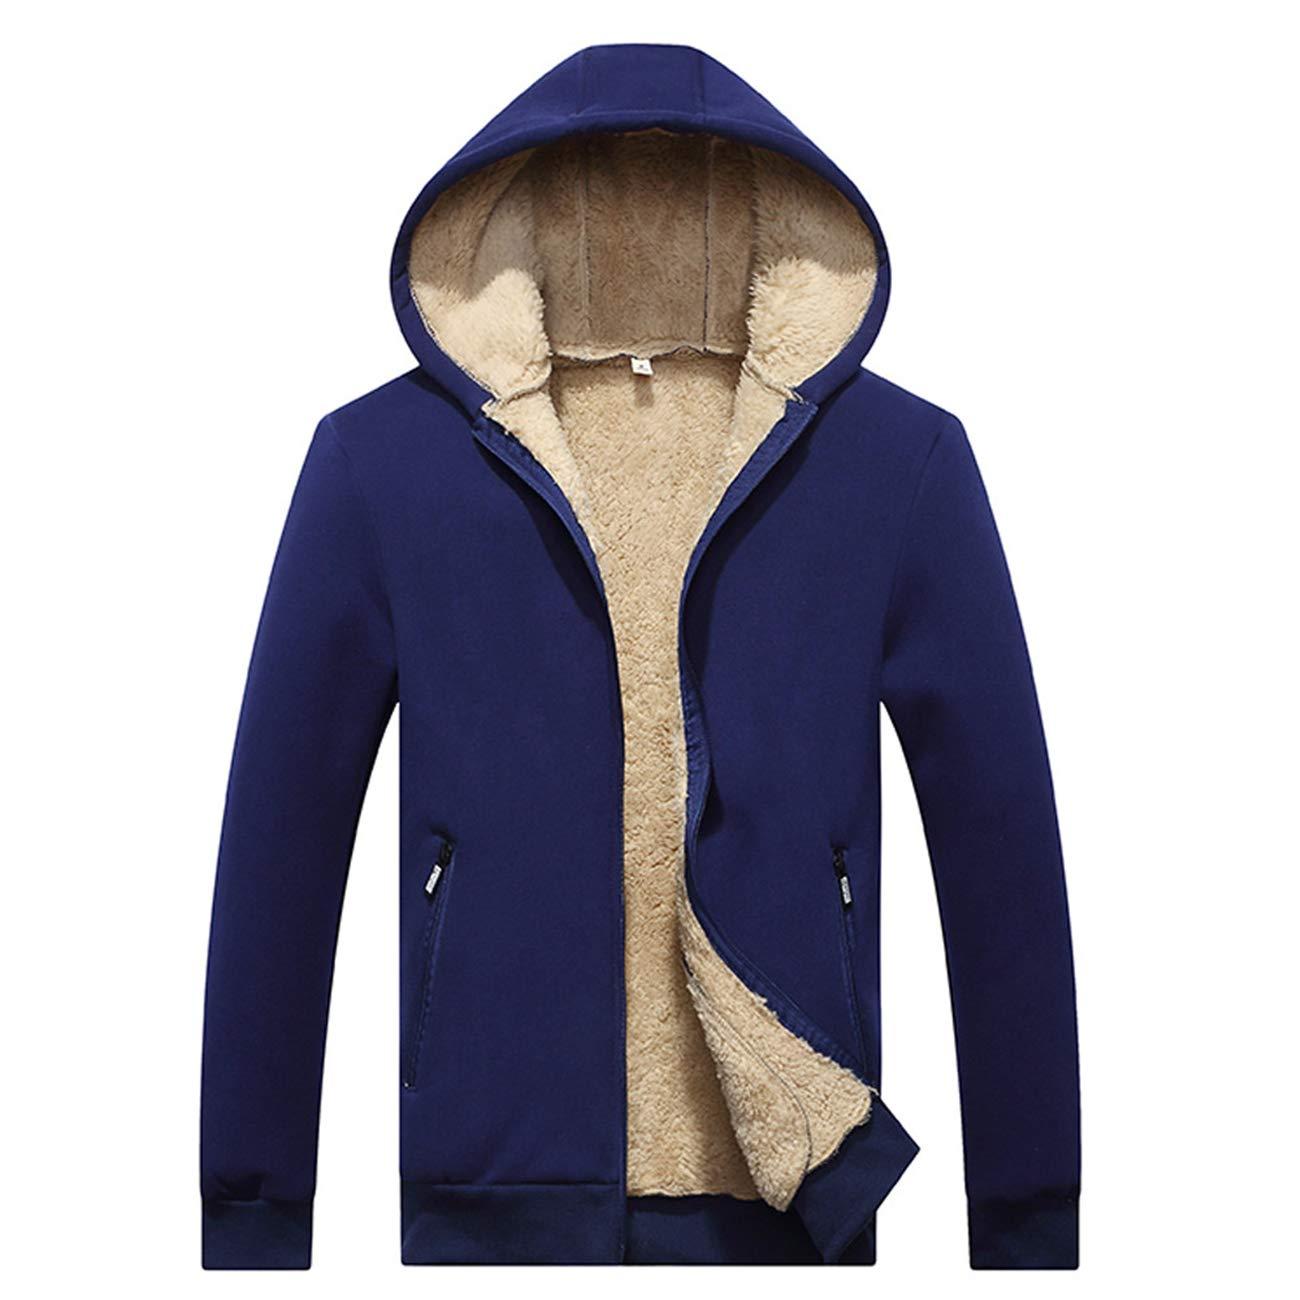 Rosennie Fashion Mens Coat,Men Autumn Winter Casual Hooded Warm Tops Long Sleeve Outwear Set Sport Gyms Loose Jacket Pocket Slim Hoodie Velvet Zipper Thickened Baseball Fleece Coat